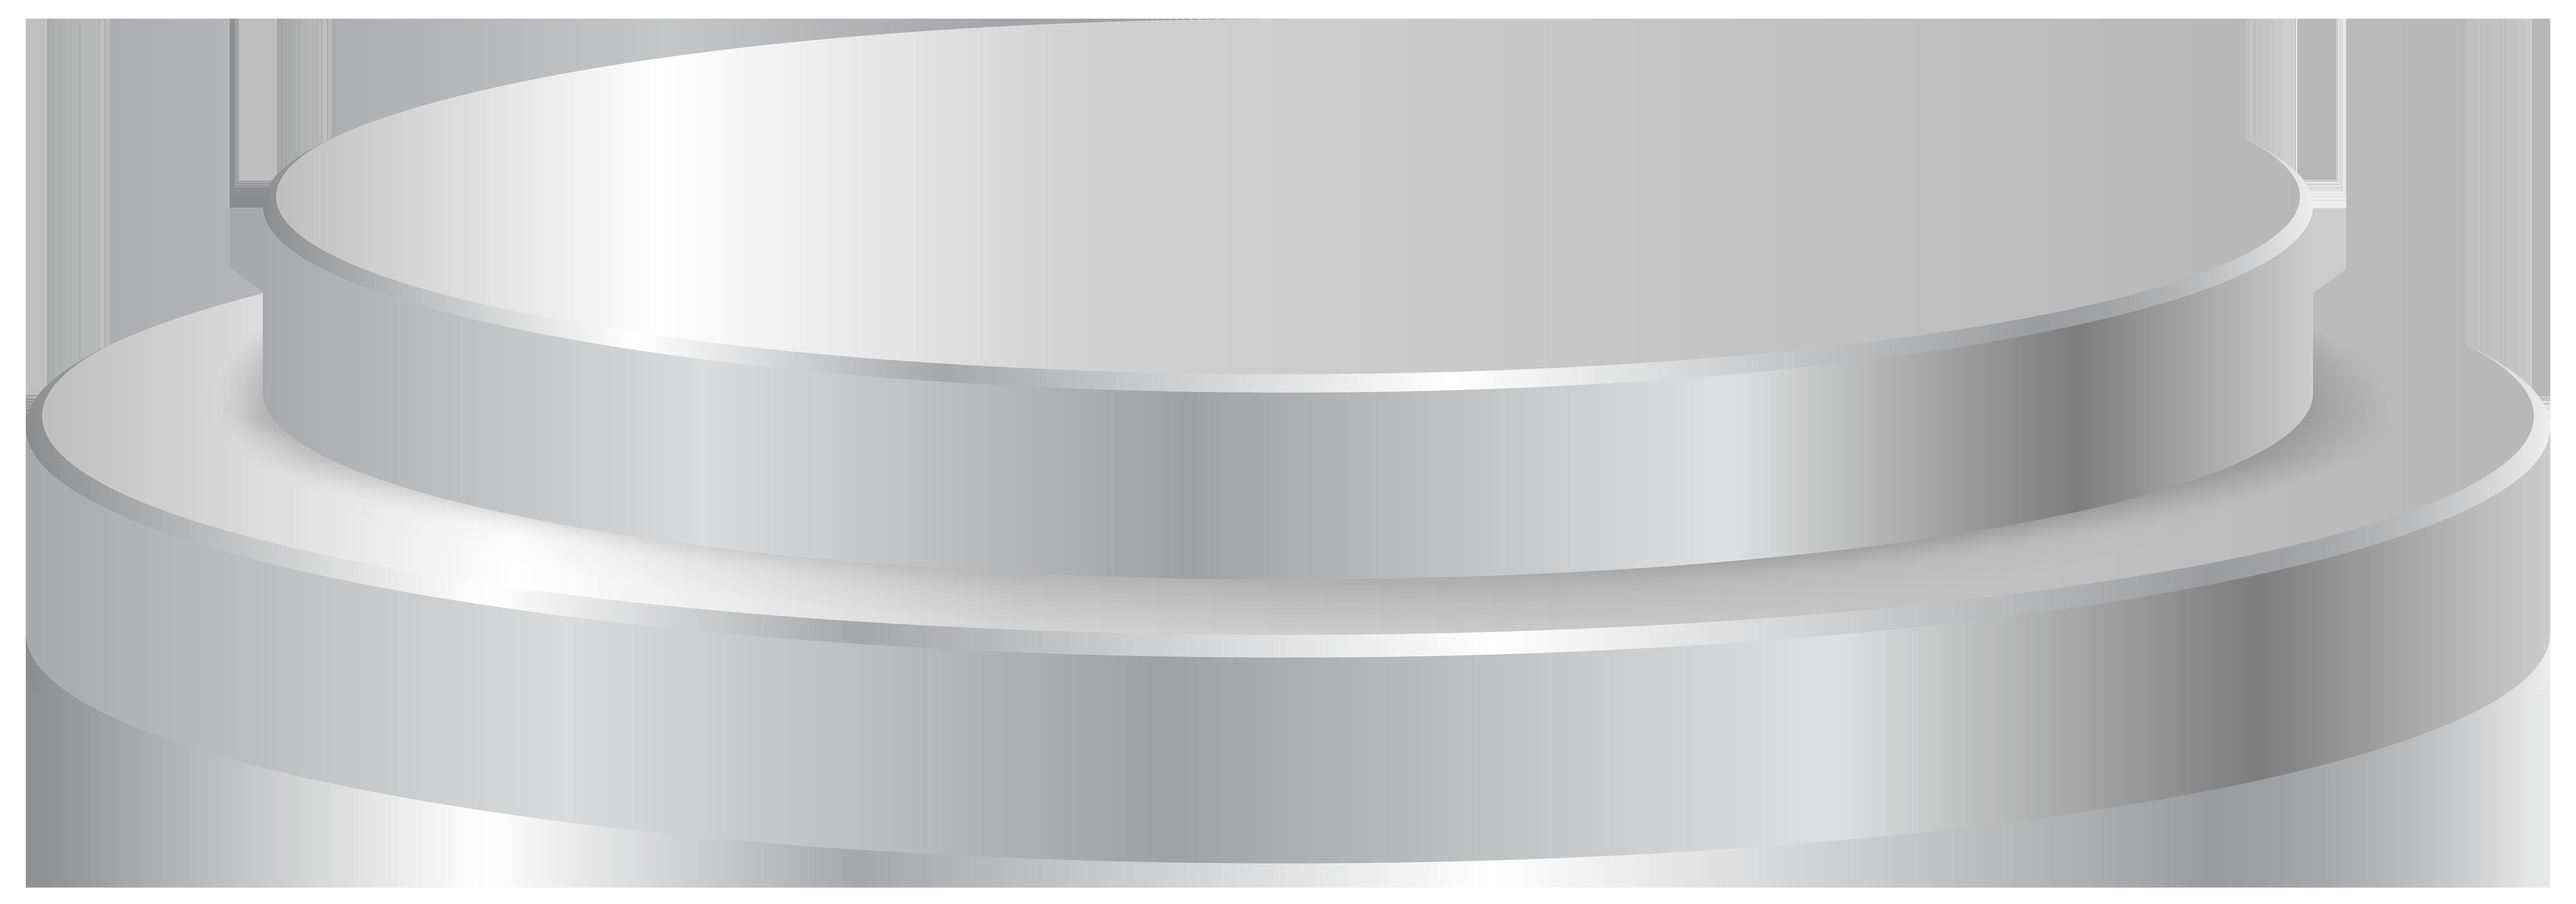 Podium Stage Transparent PNG Clip Art Image.